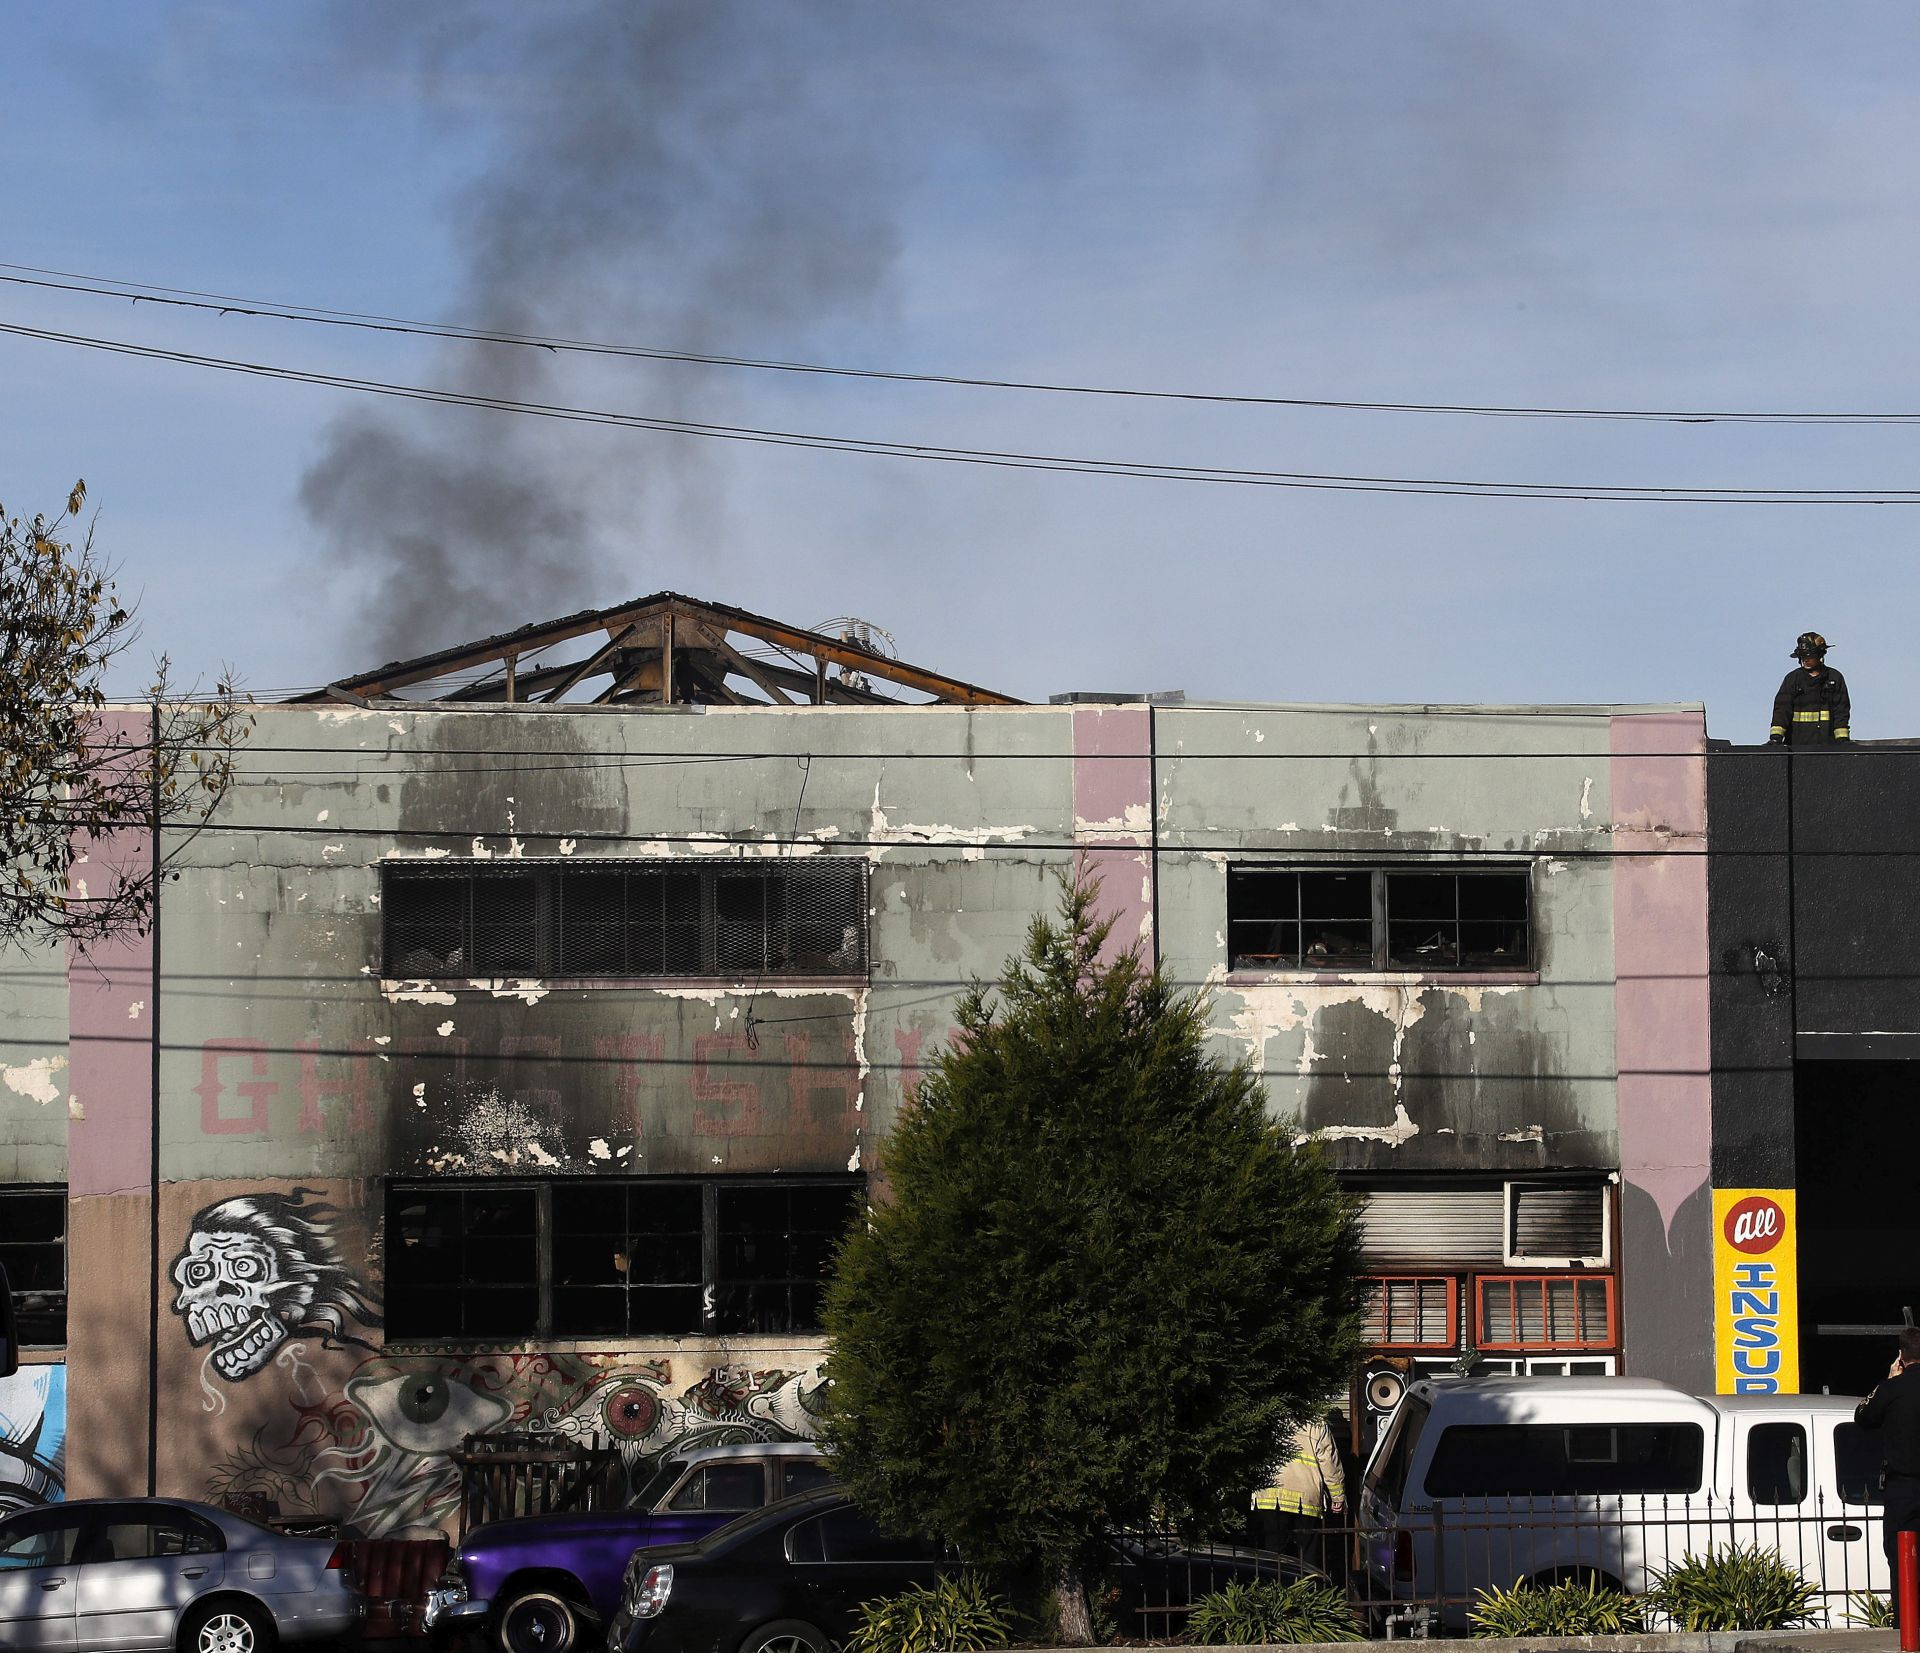 POŽAR U NOĆNOM KLUBU: Broj žrtava u Oaklandu narastao na 33